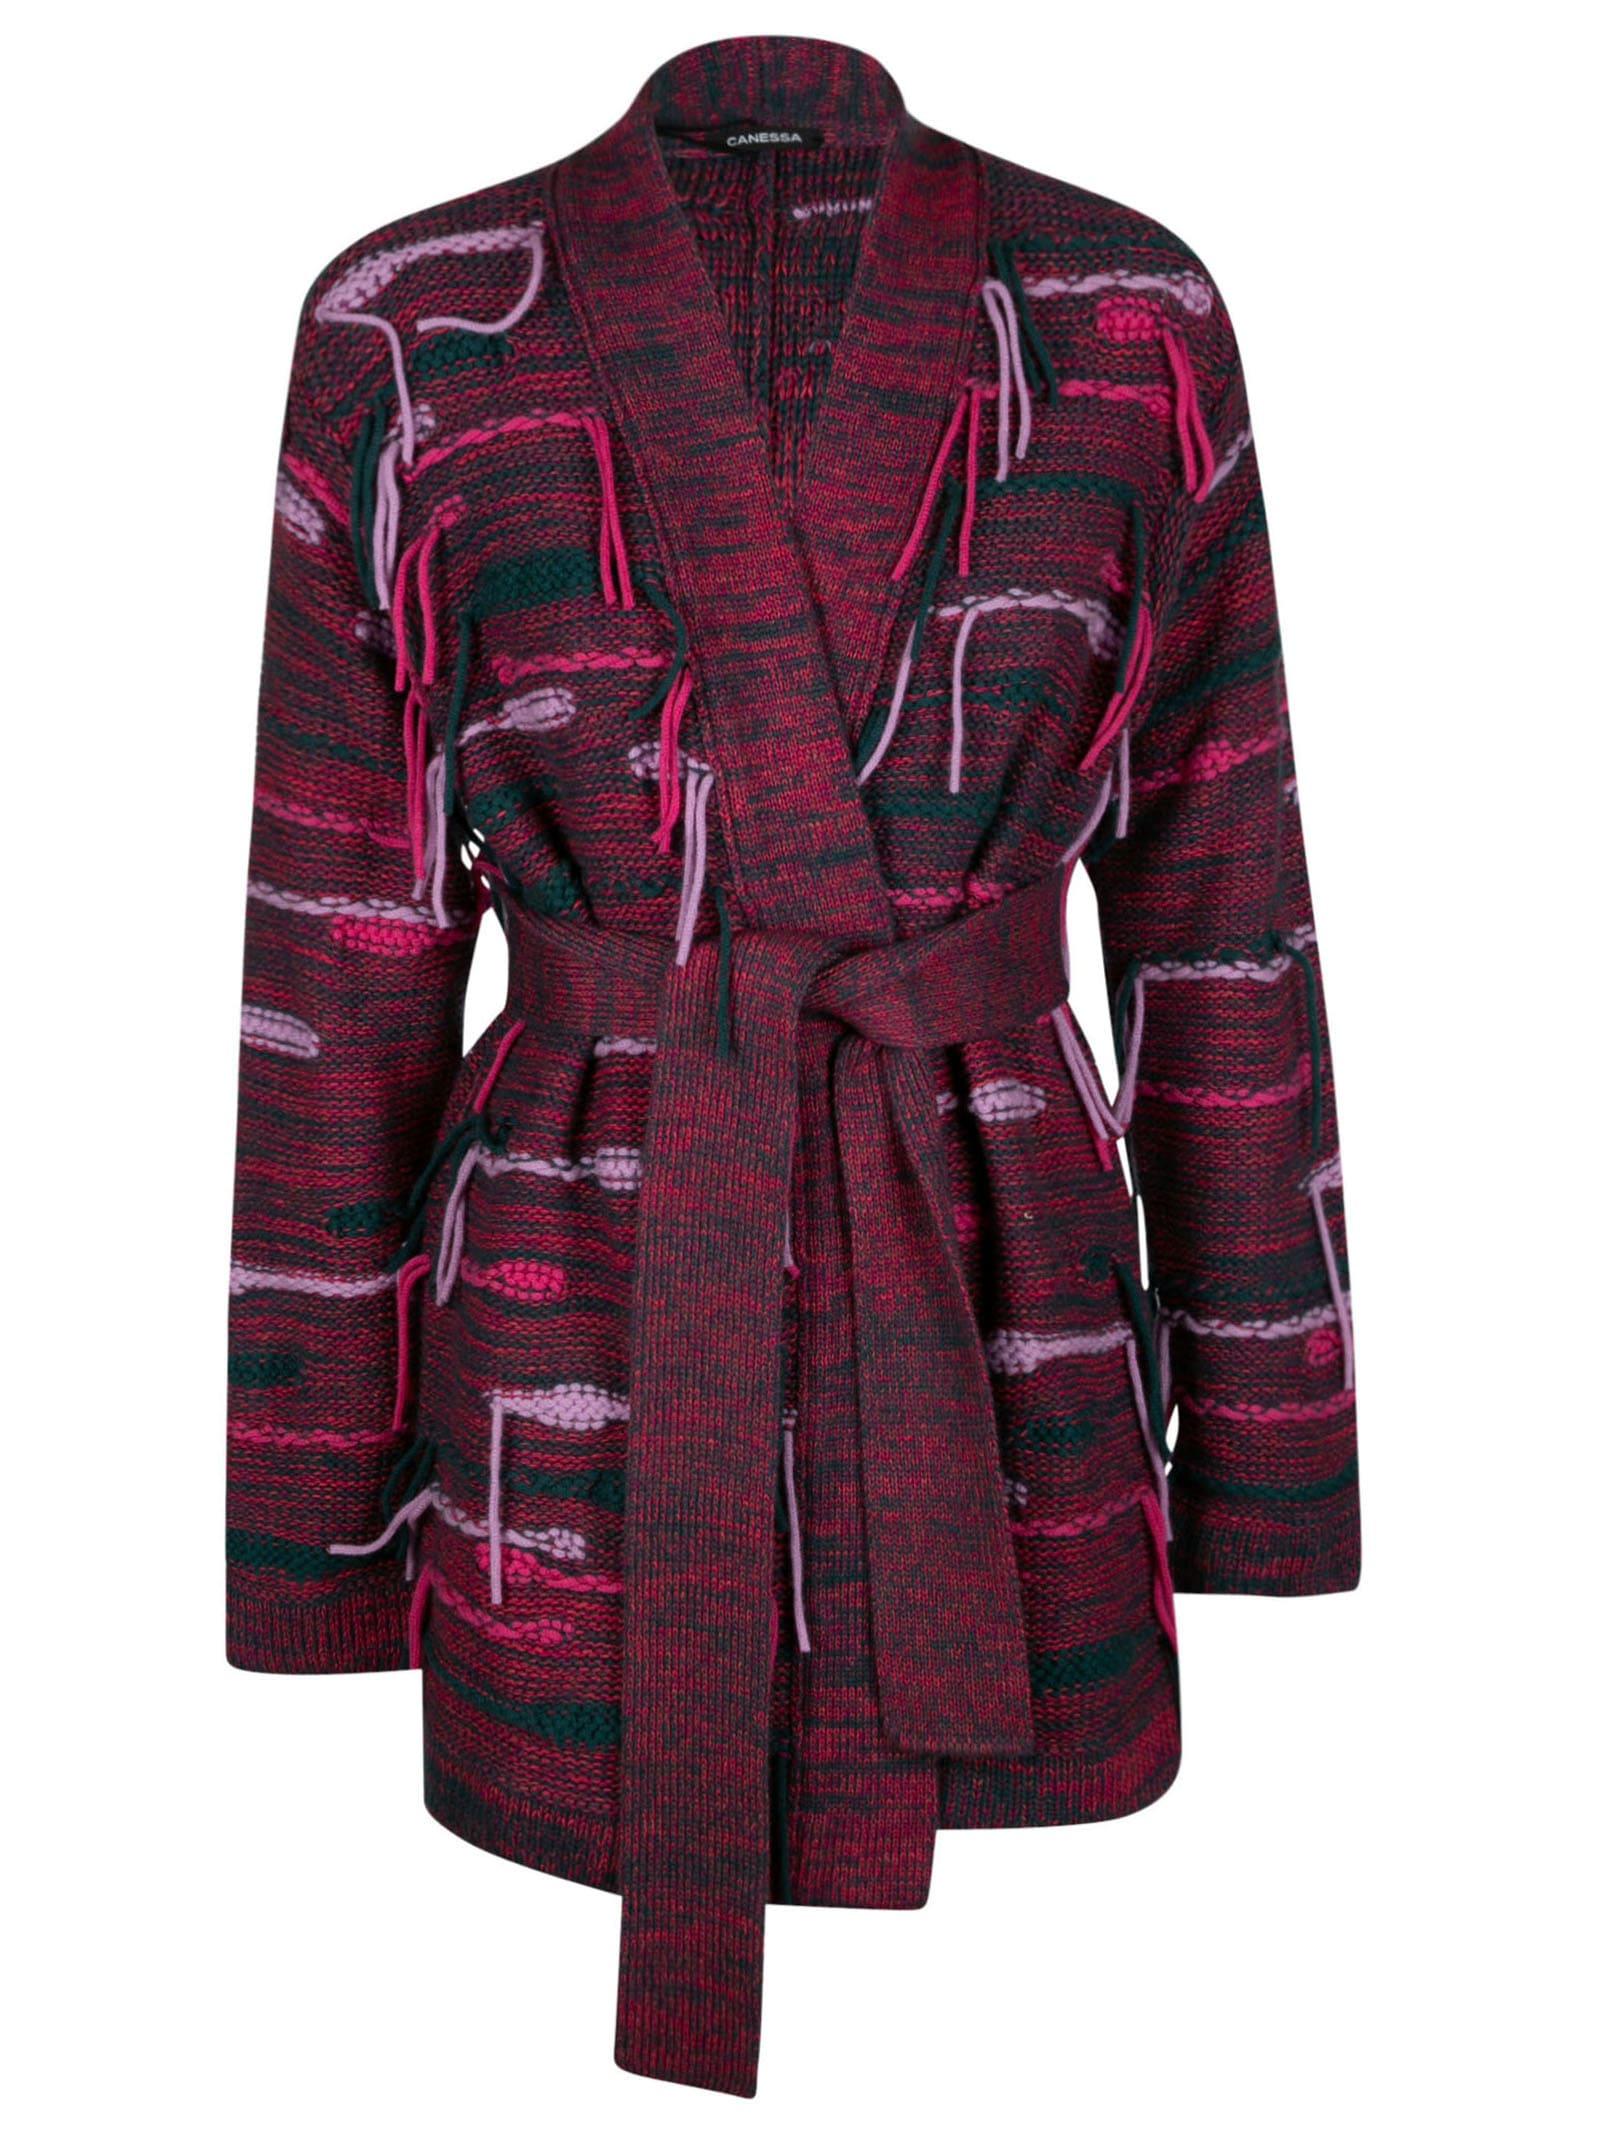 Tassel Detail Knit Cardi-coat